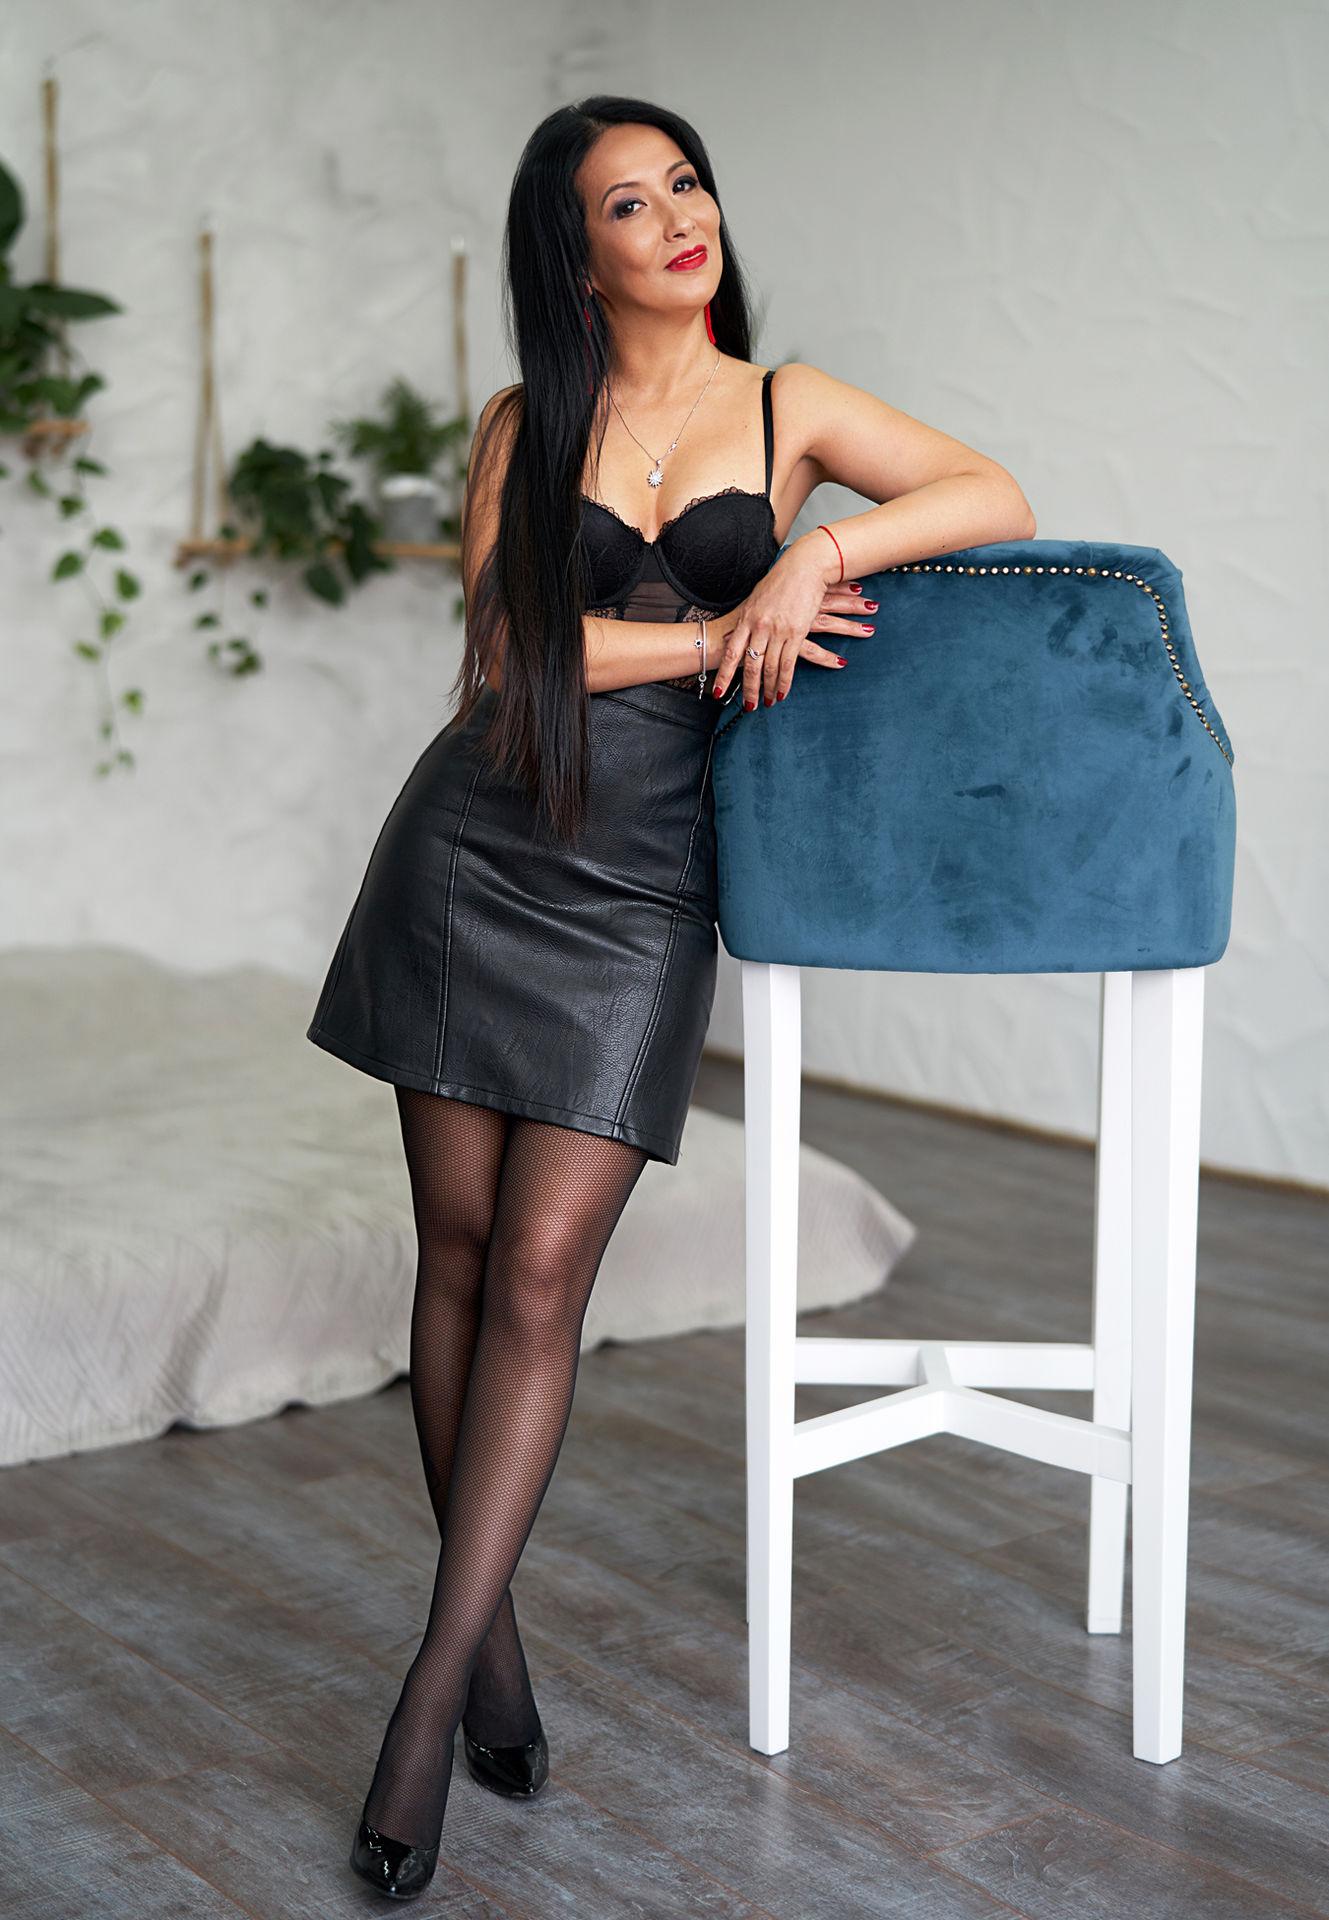 russische madchen strumpfhose high heels